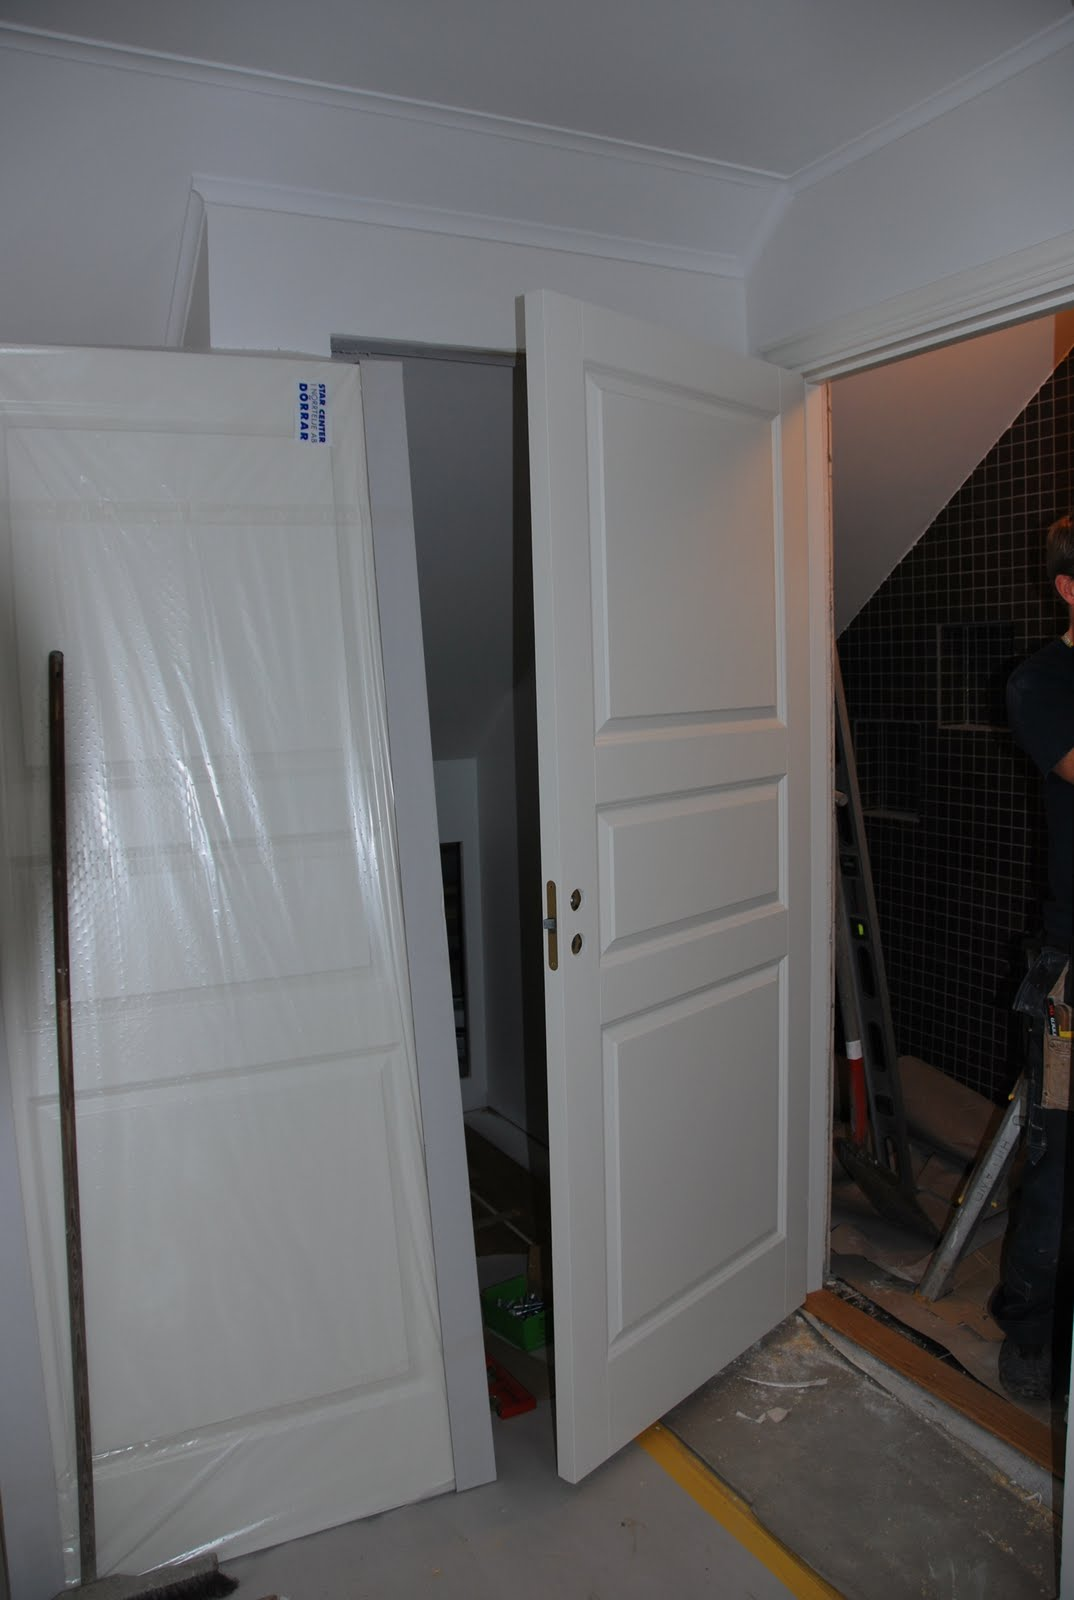 Milo & vera: november 2009